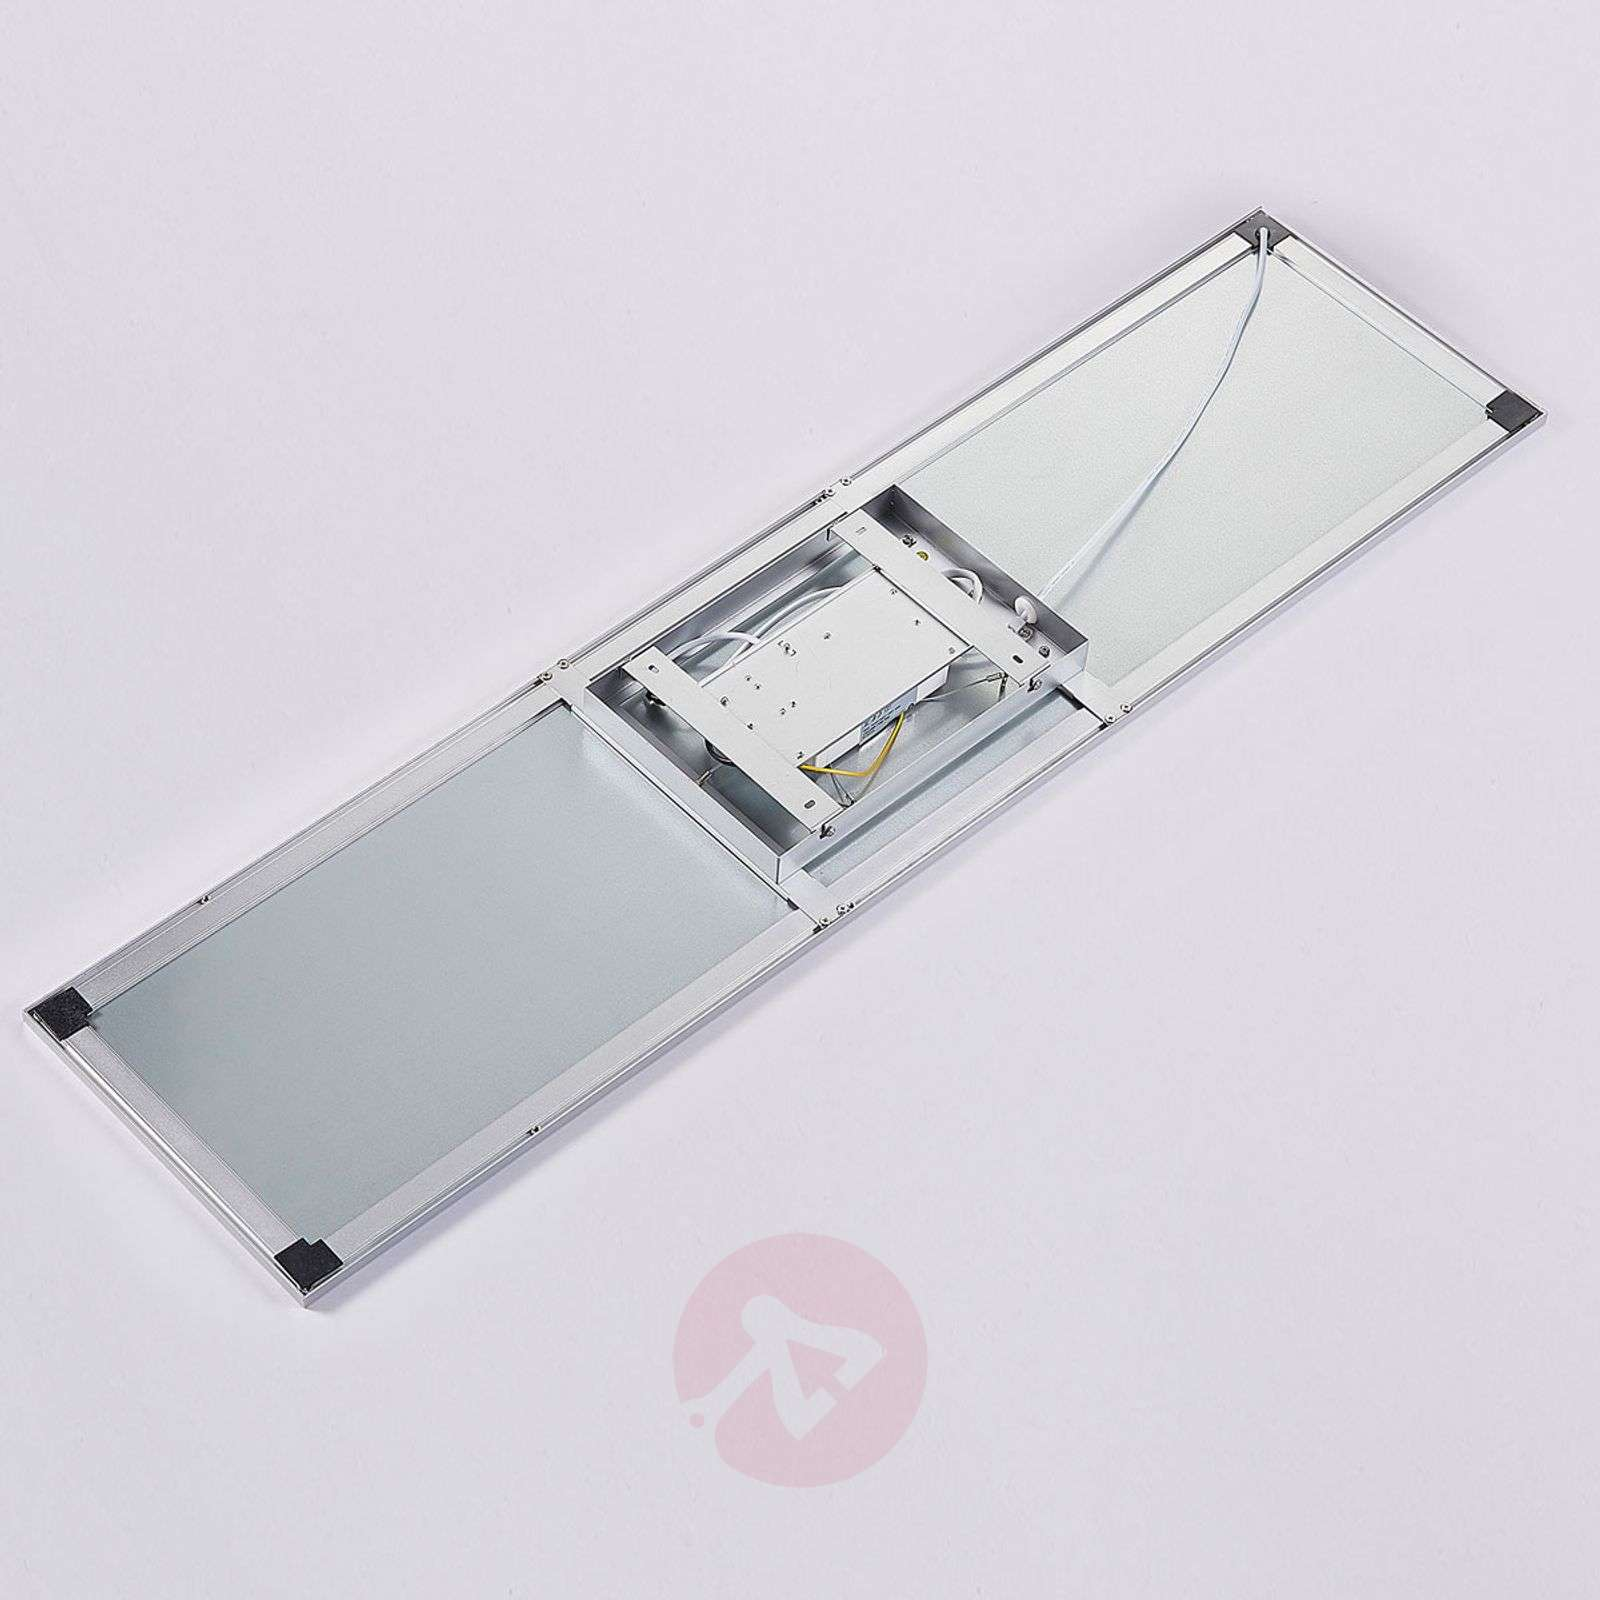 Lysander LED-kattovalaisin, värinvaihdolla-9621553-01